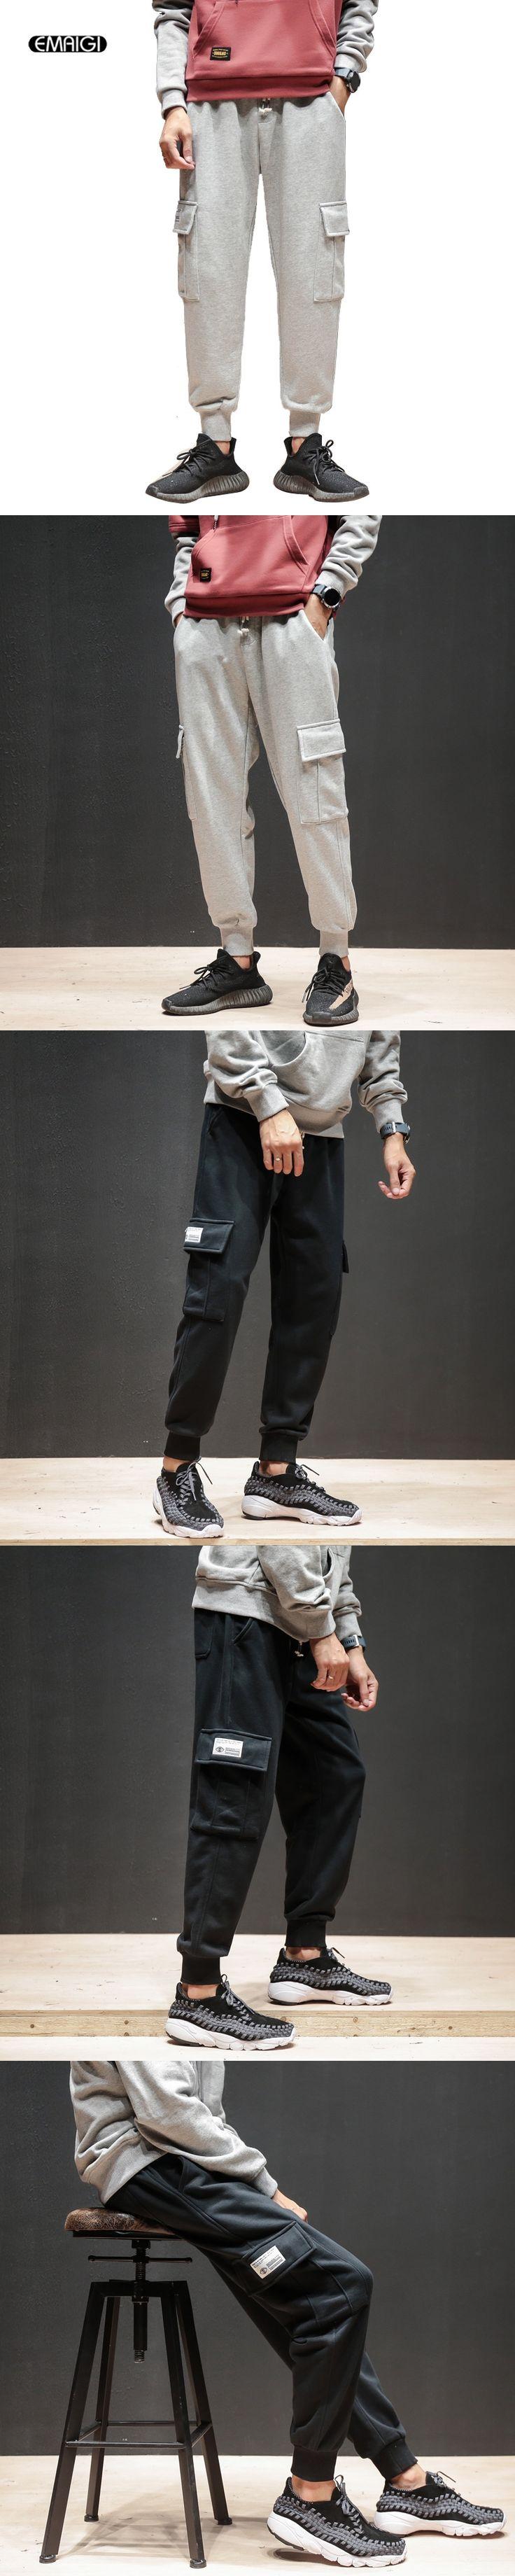 Men New Street Fashion Casual Cargo Pants Jogger Loose Cotton Harem Trousers Male Sweatpants